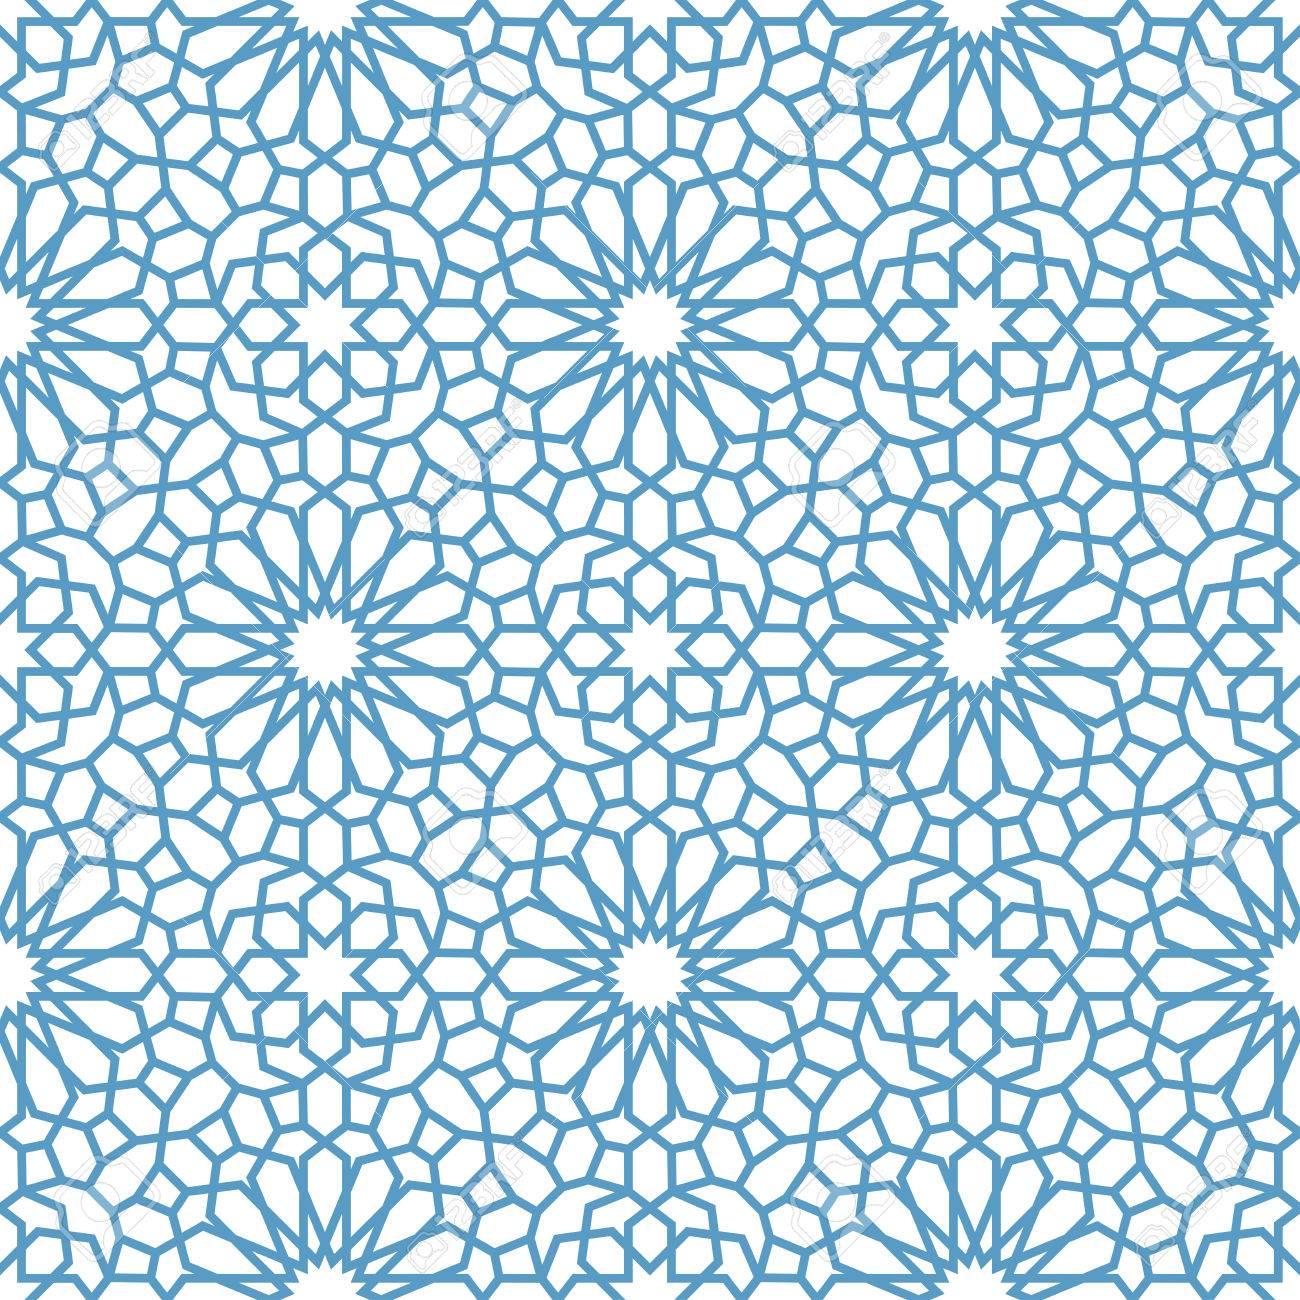 Arabic seamless pattern. Pattern fills. Oriental, arabic style. Mosaic seamless patterns. Arabic ornaments. Vector illustration. - 57465474